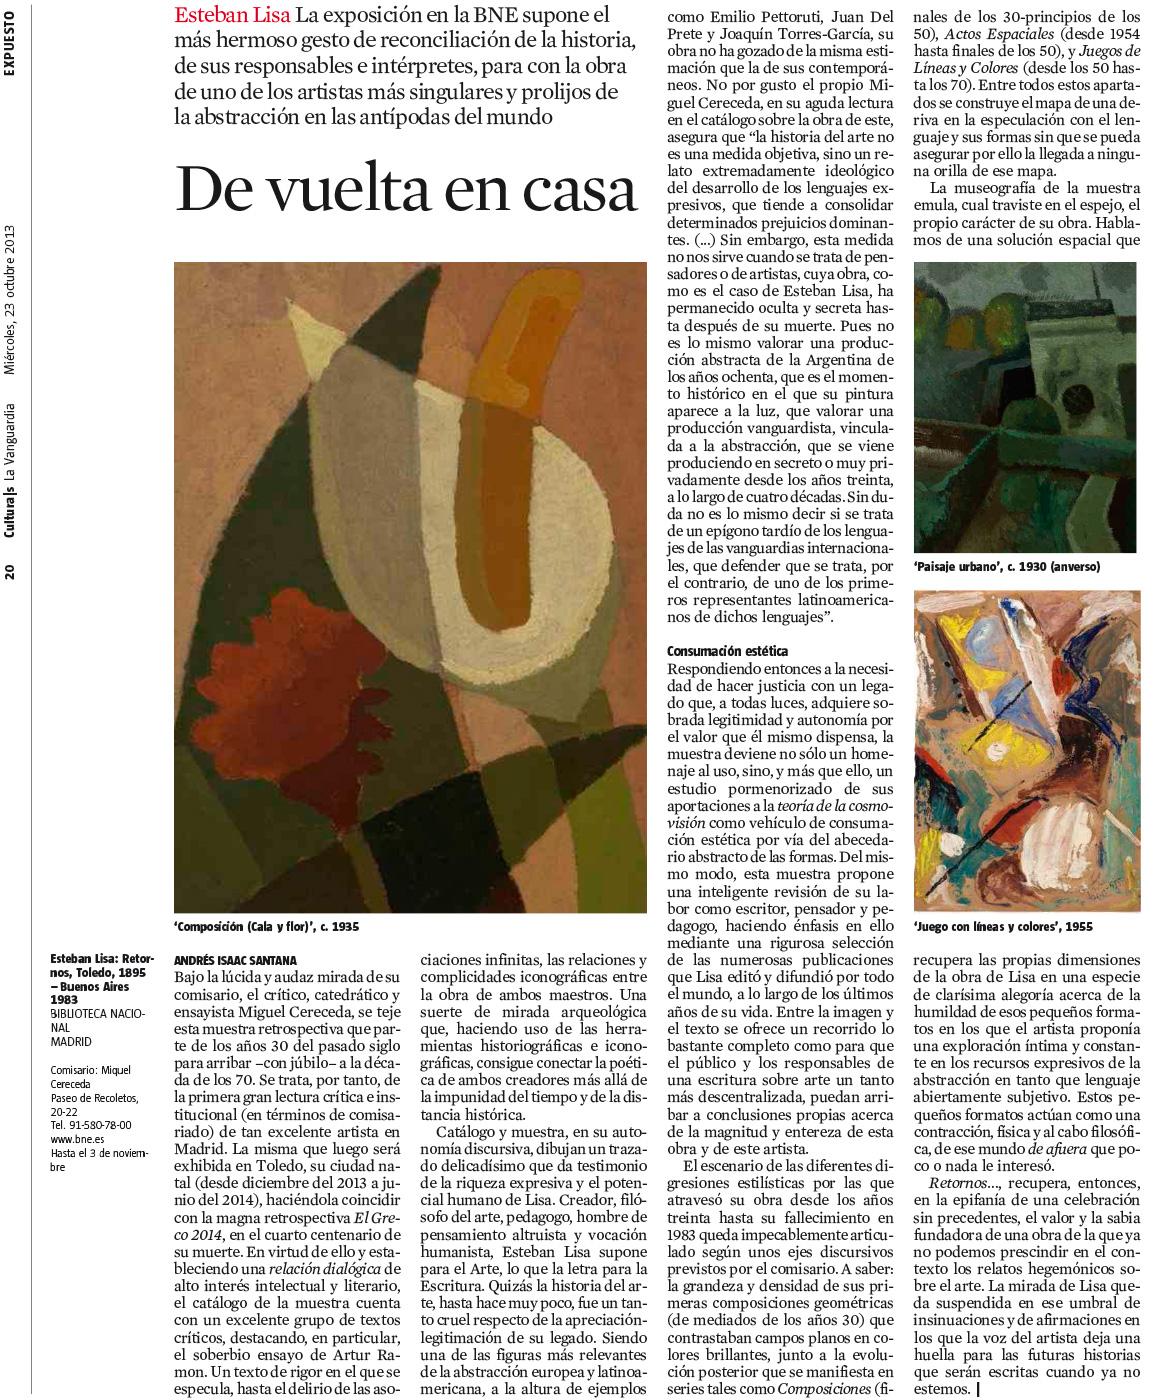 De vuelta en casa (La Vanguardia)